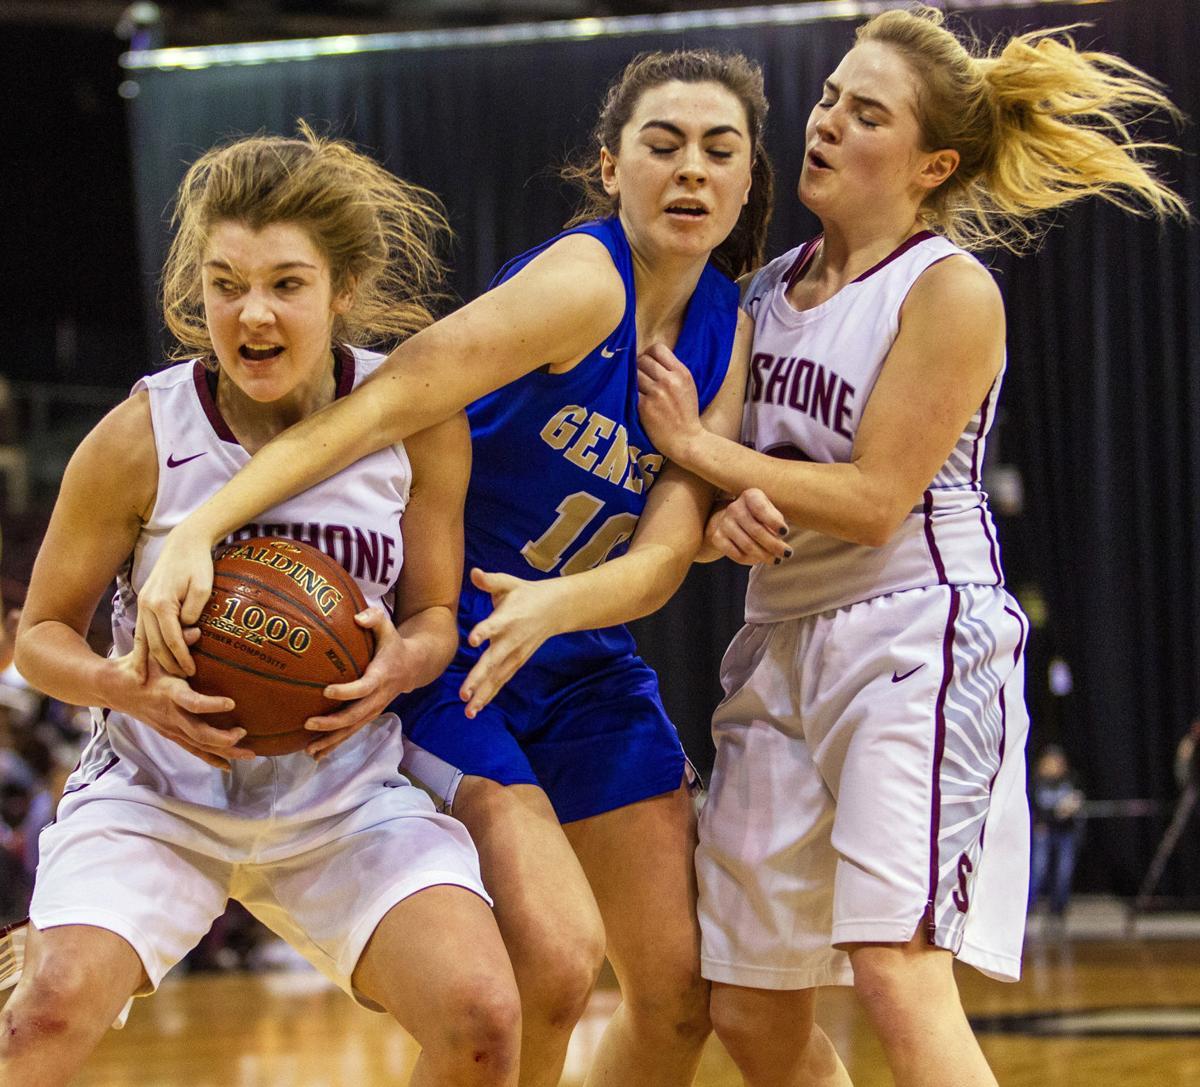 Shoshone vs Genesee girls championship